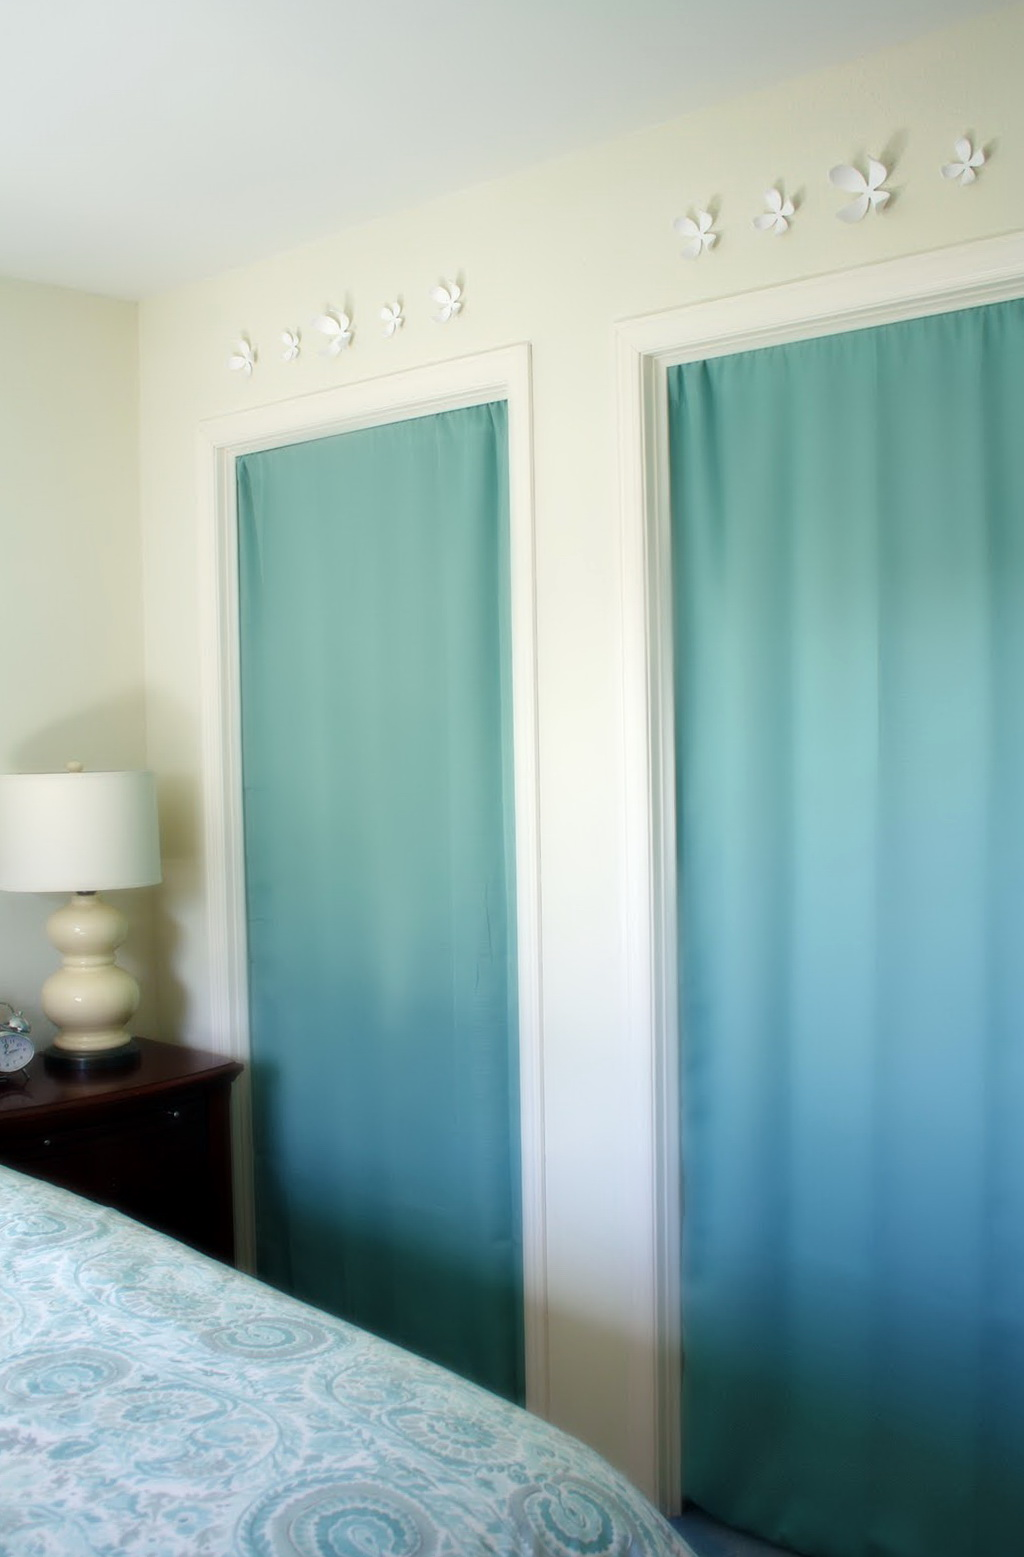 Panel Curtain Closet Door Home Design Ideas